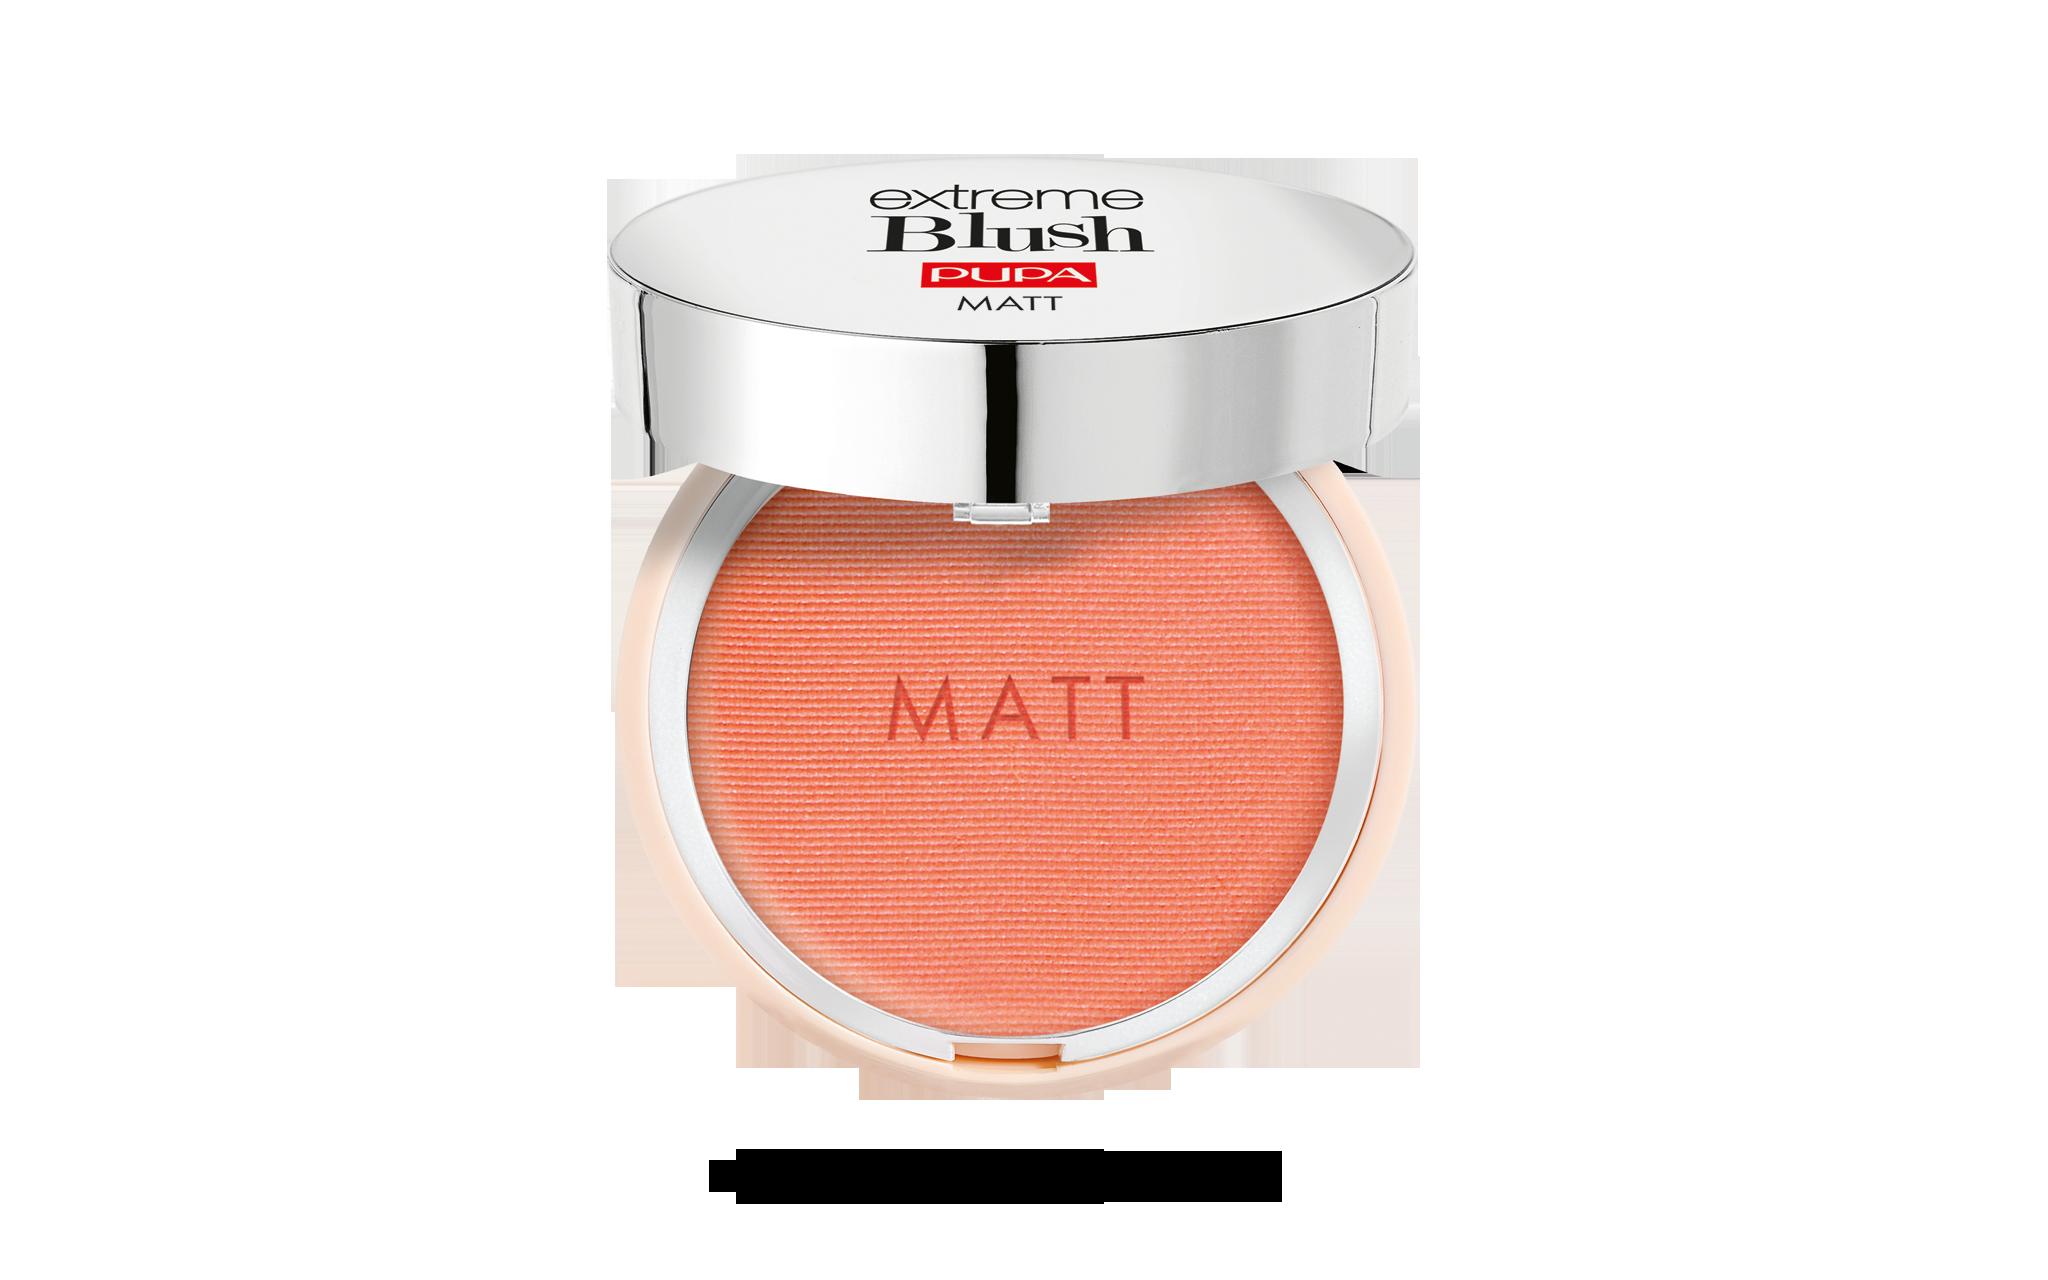 Extreme Blush Matt - PUPA Milano